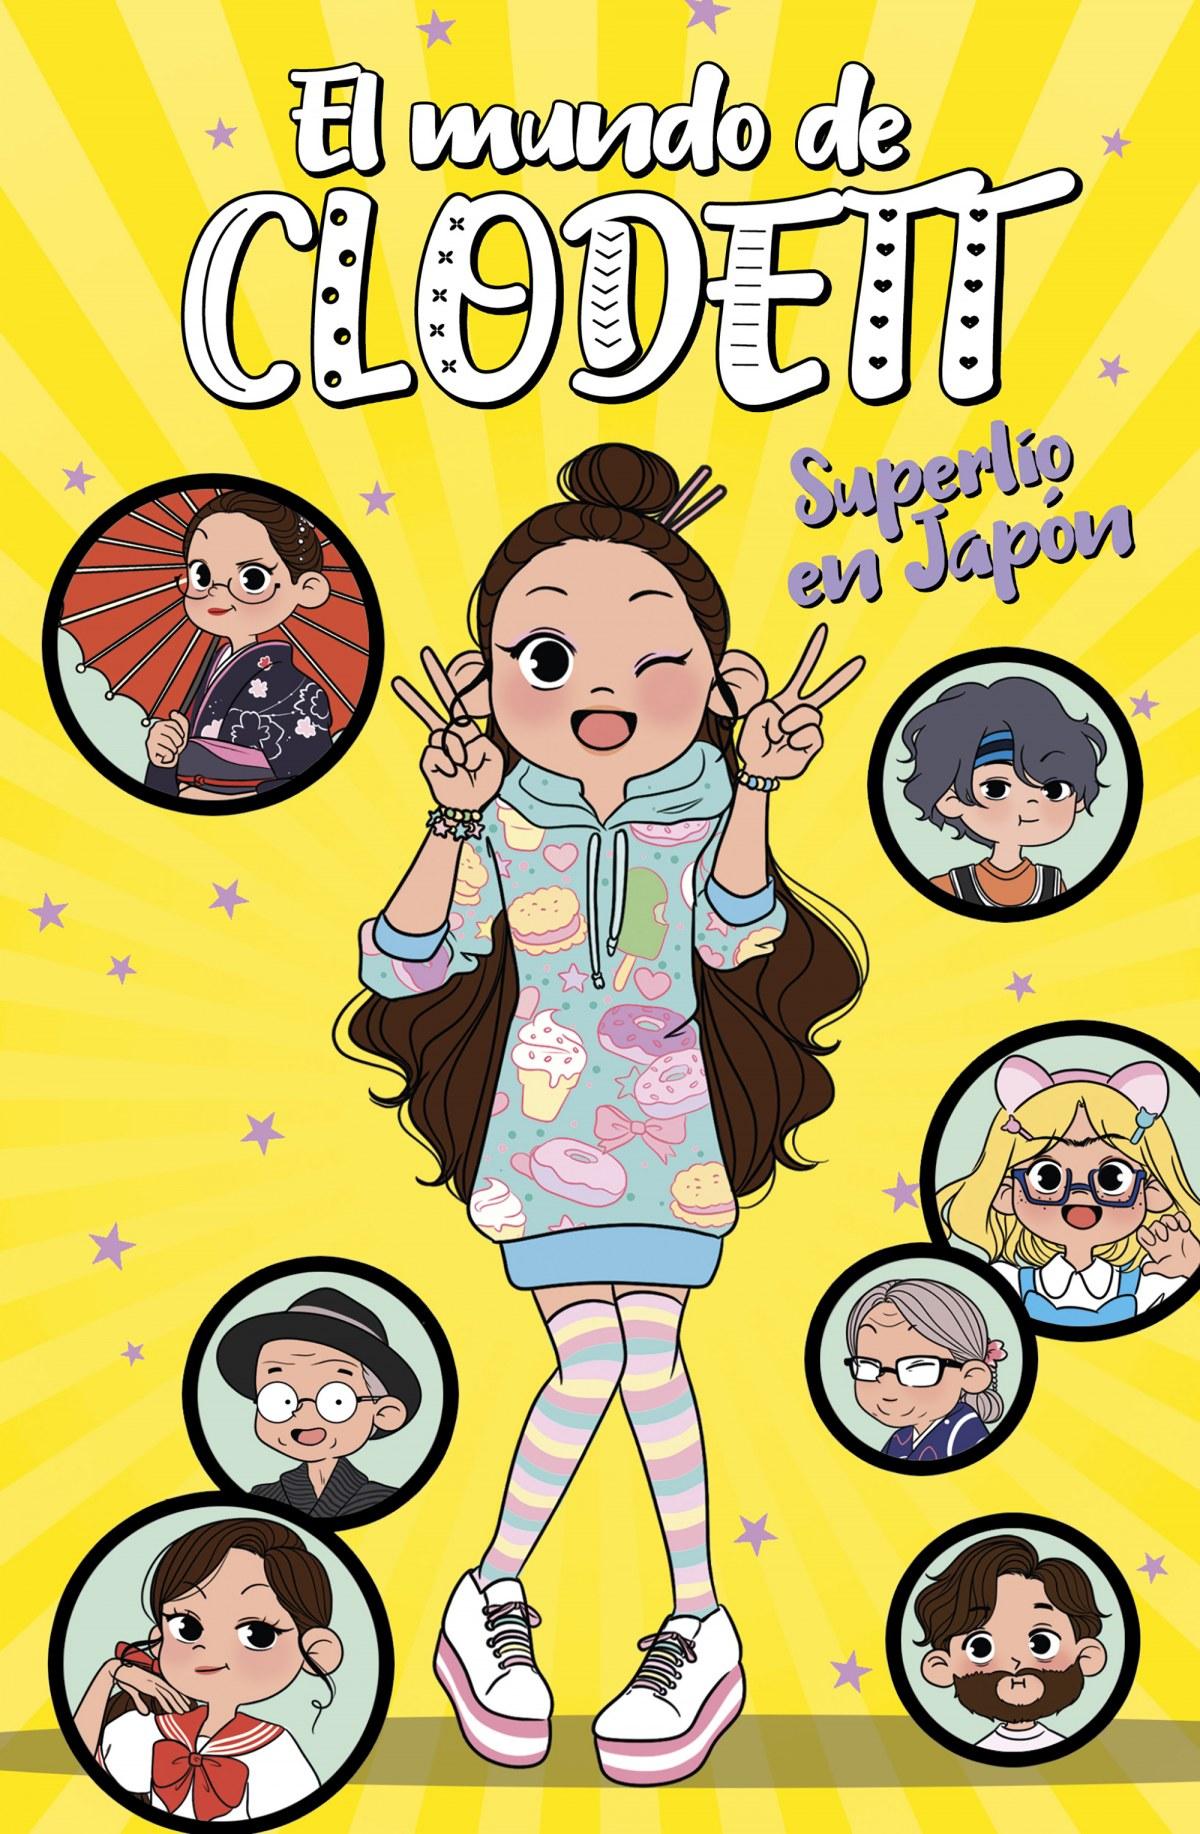 Superl¡o en Japón (El mundo de Clodett 5) 9788418038068